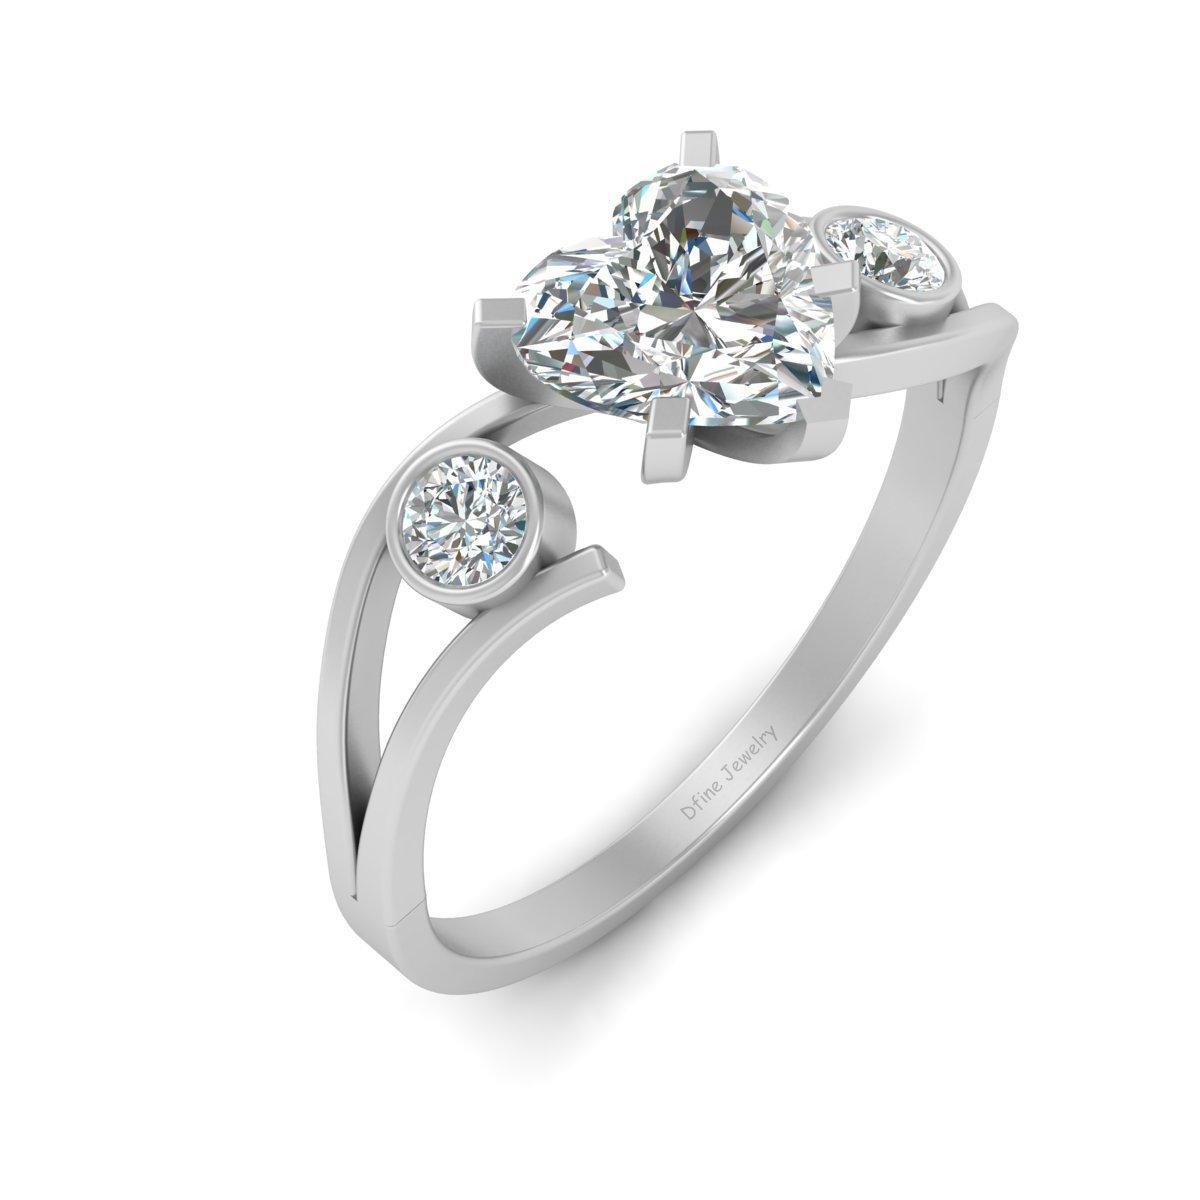 Heart Shape Diamond Ring For Women 3 Stone Promise Ring For Her Wedding Jewelry - $89.99